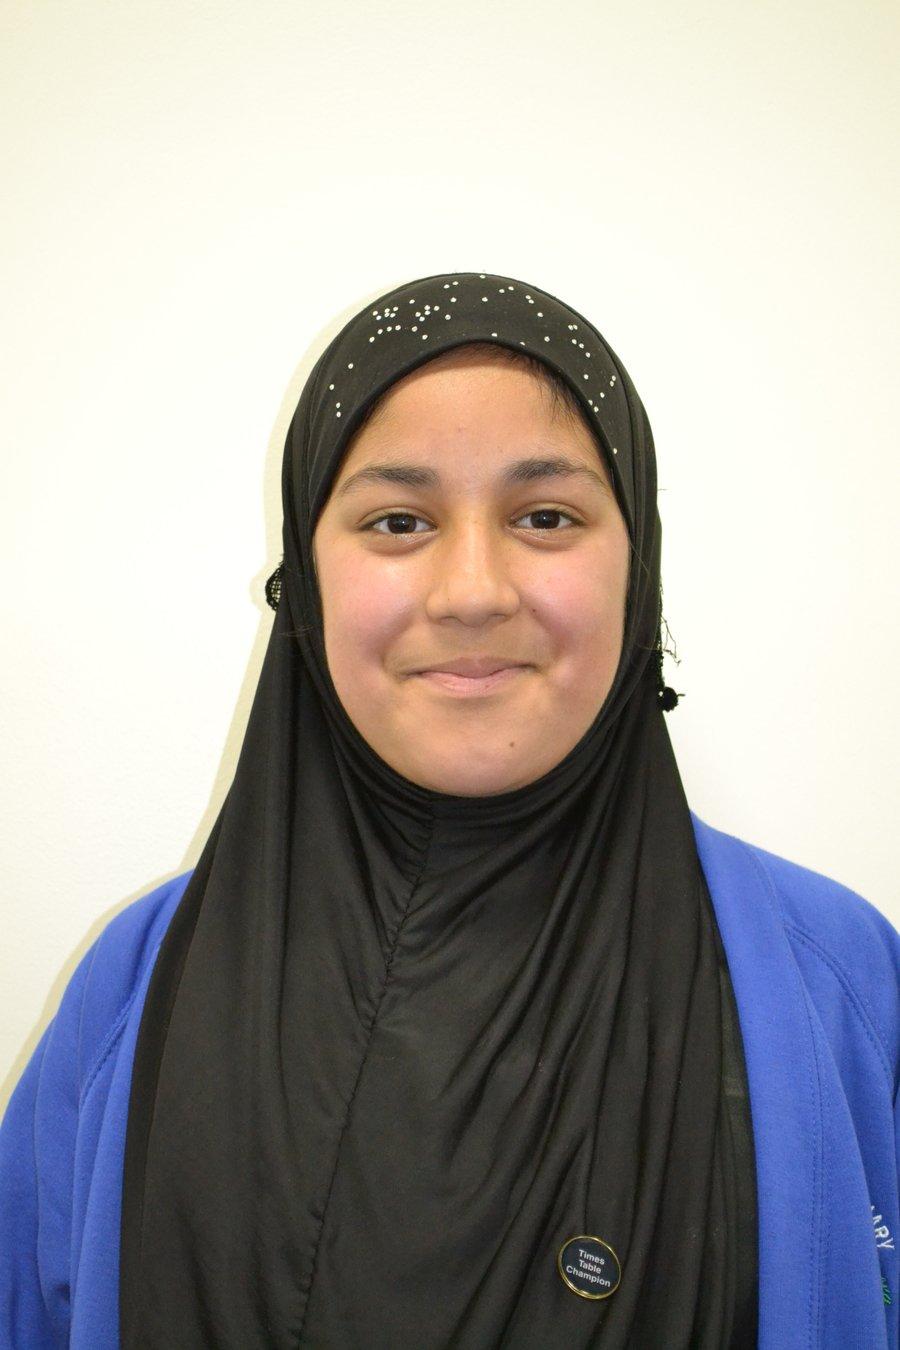 Well done Amina!